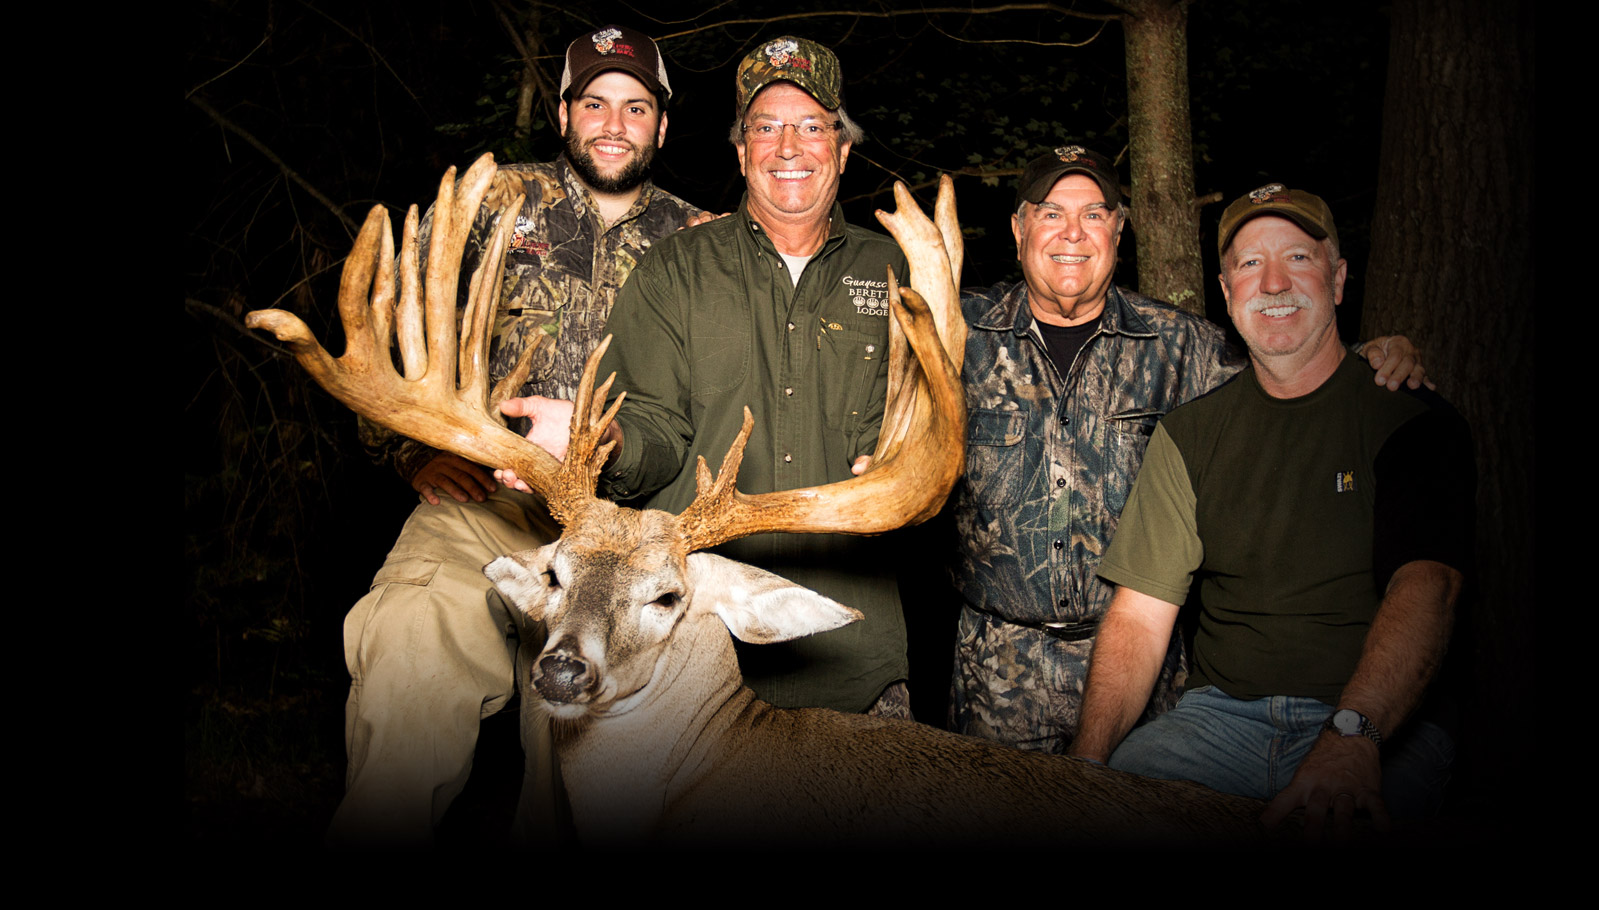 Michigan Trophy Whitetail Hunts, Large Whitetail Deer Trophy